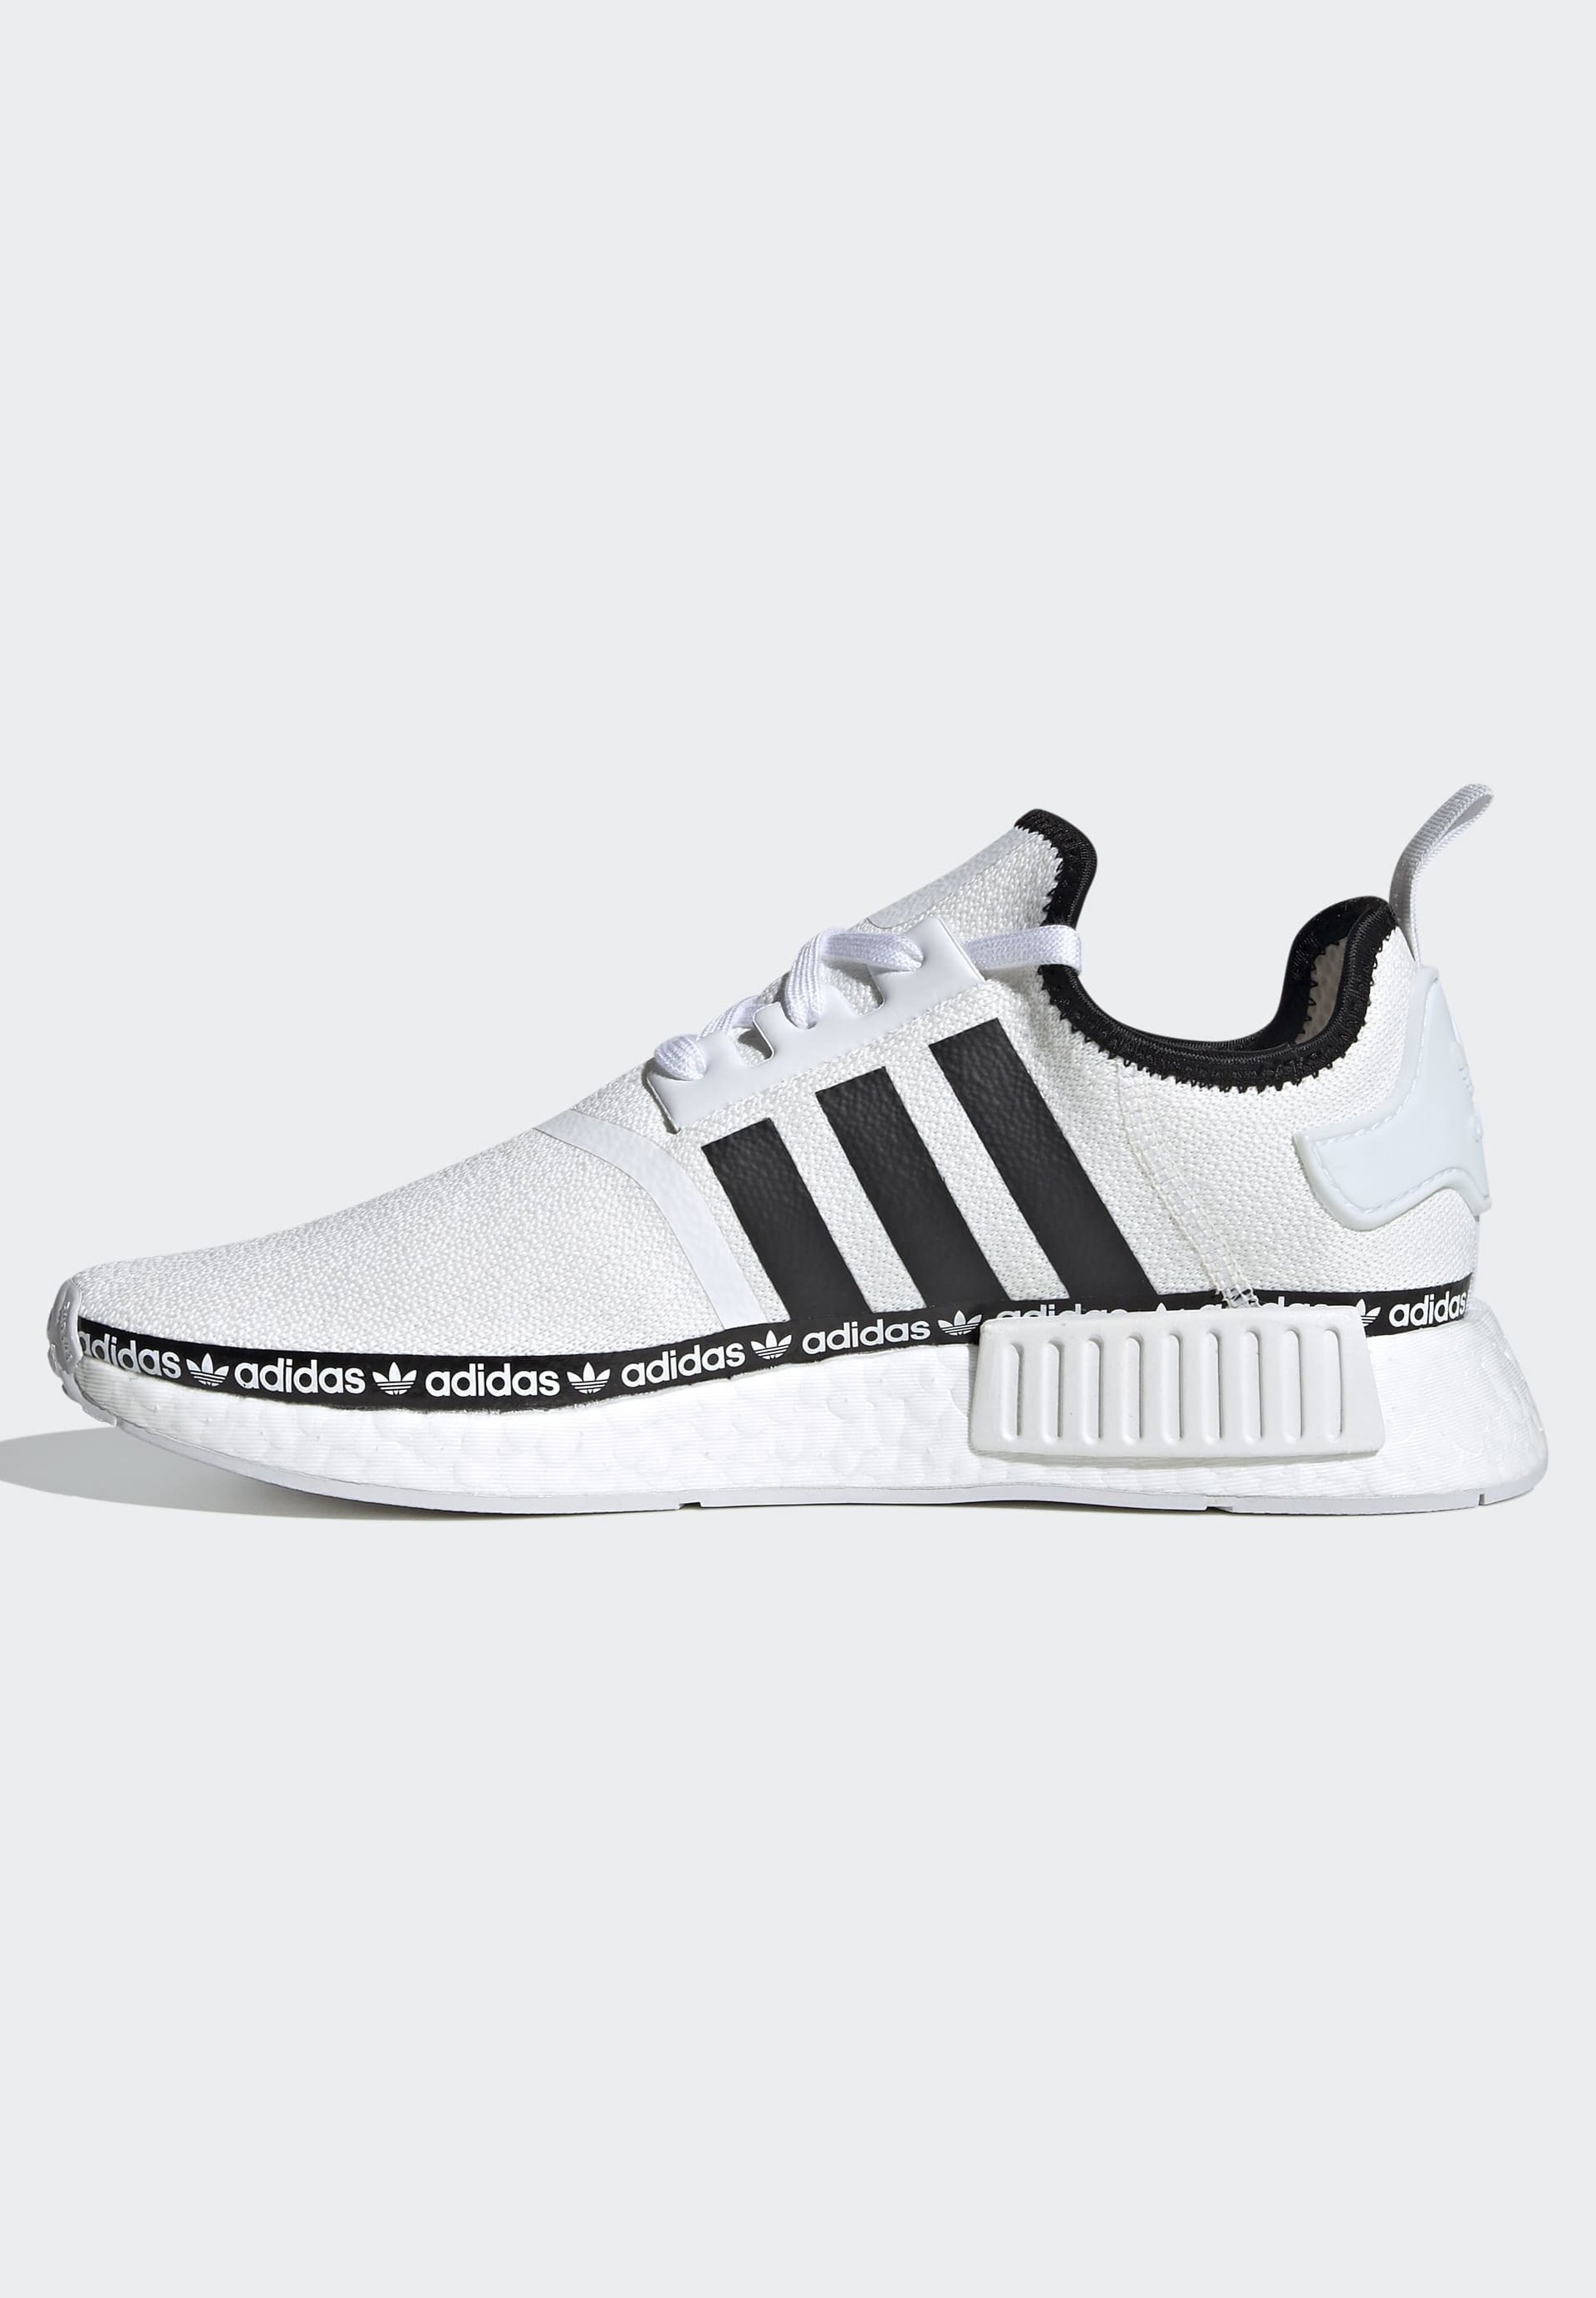 Adidas Originals Nmd_r1 - Joggesko White/hvit